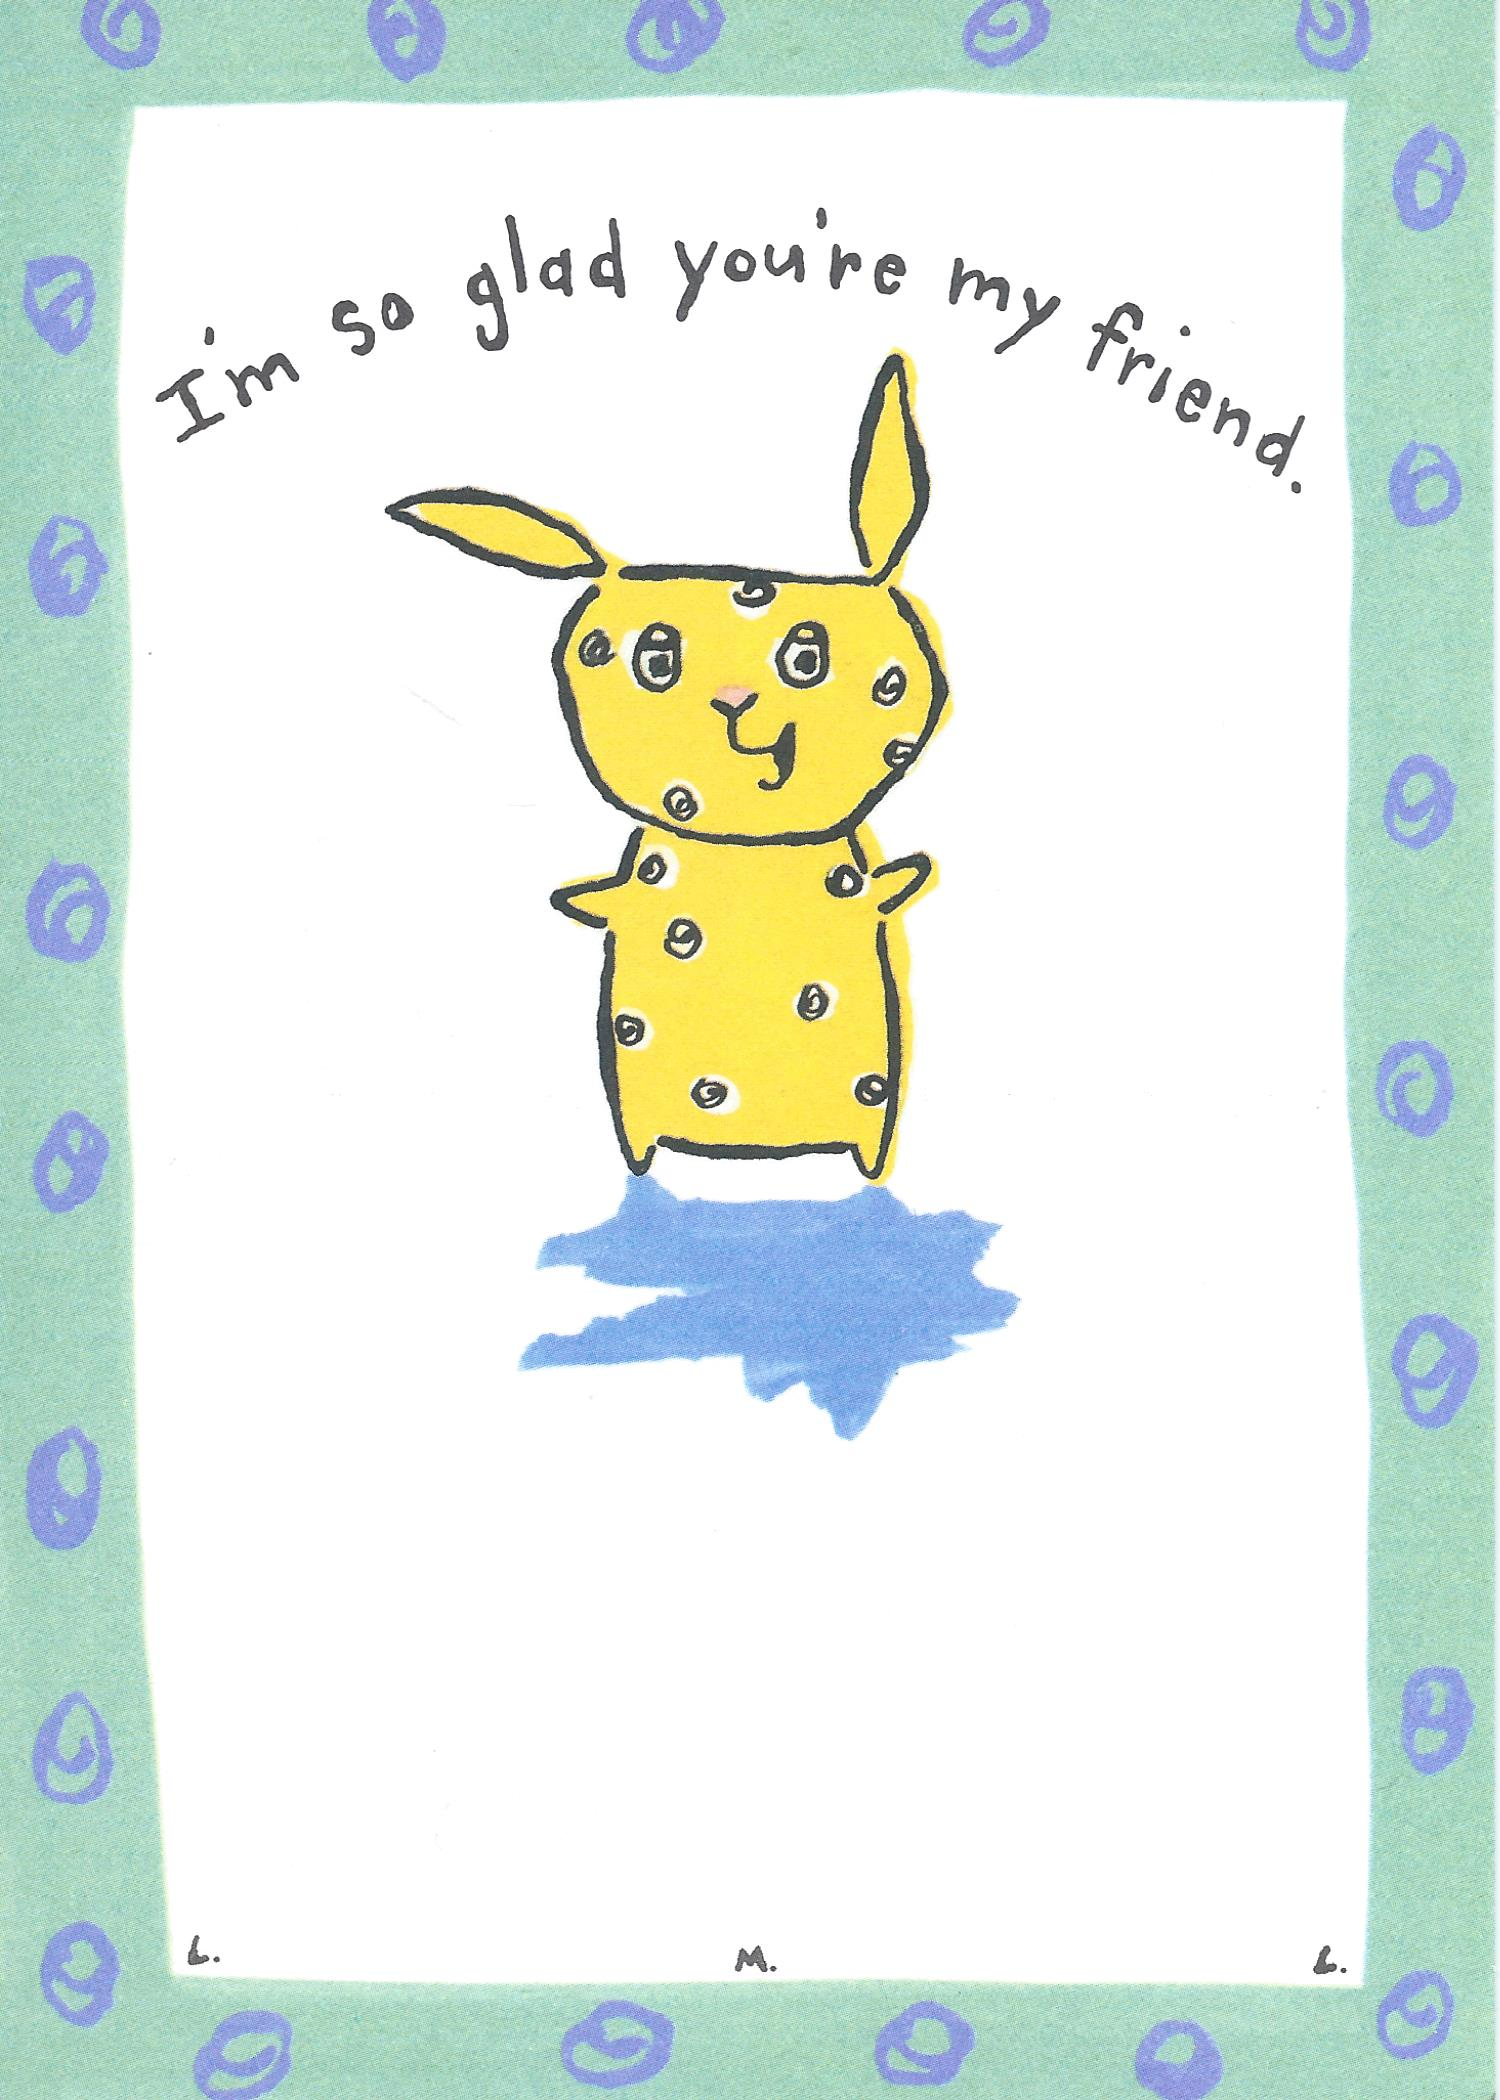 I'm so glad you're my friend.